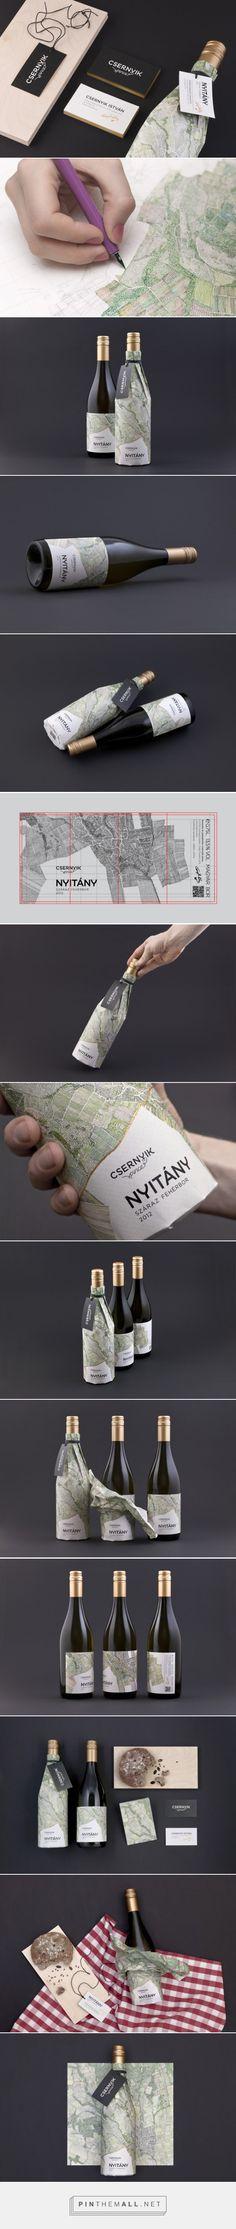 Nyitány #Wine Label designed by Peltan-Brosz Roland and Rohmann Nóra - http://www.packagingoftheworld.com/2015/04/csernyik-pince-nyitany-wine-label.html